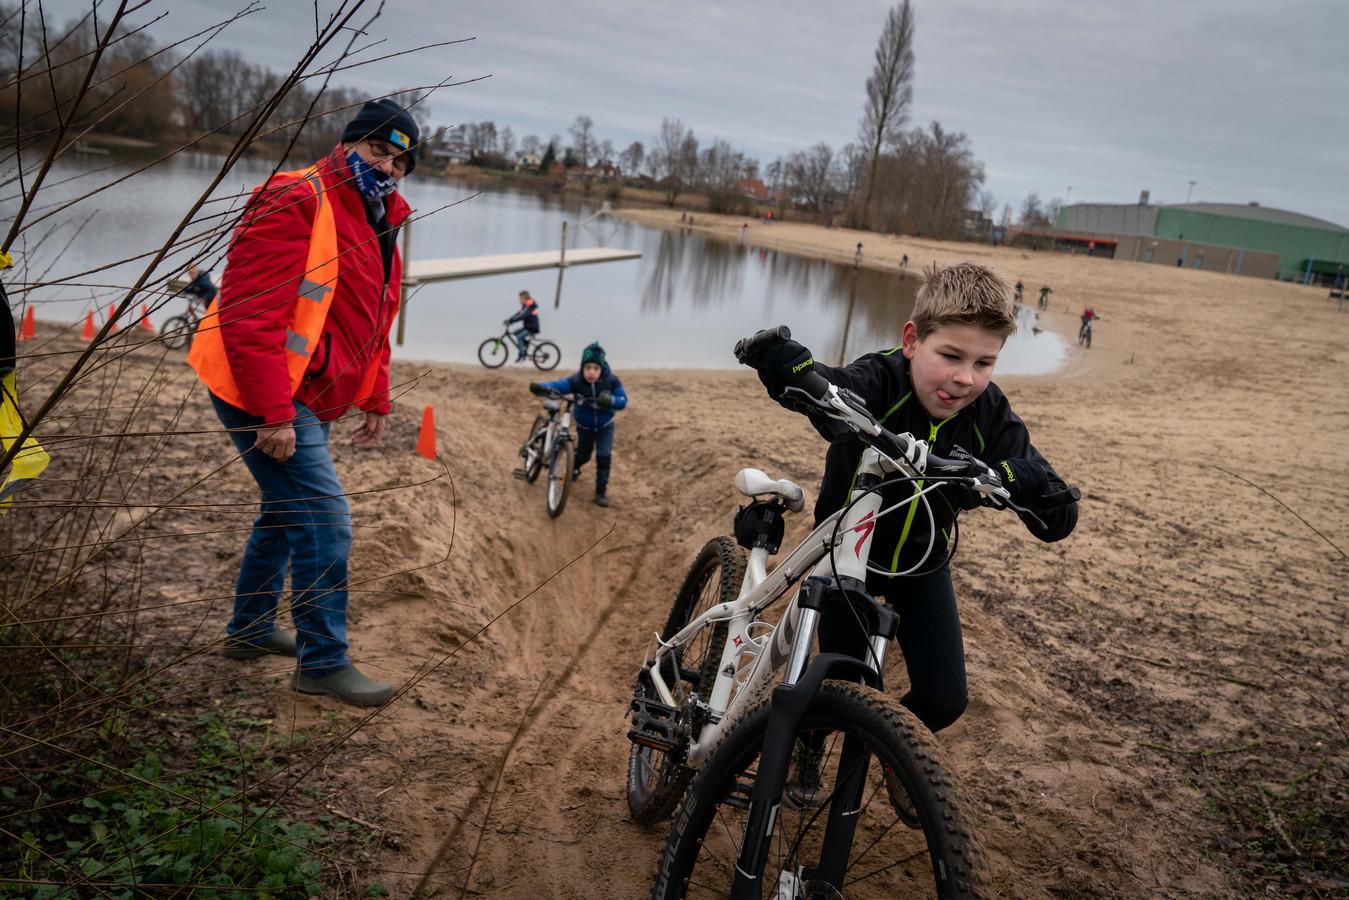 Fietscrossende kinderen op sportpark Walburgen